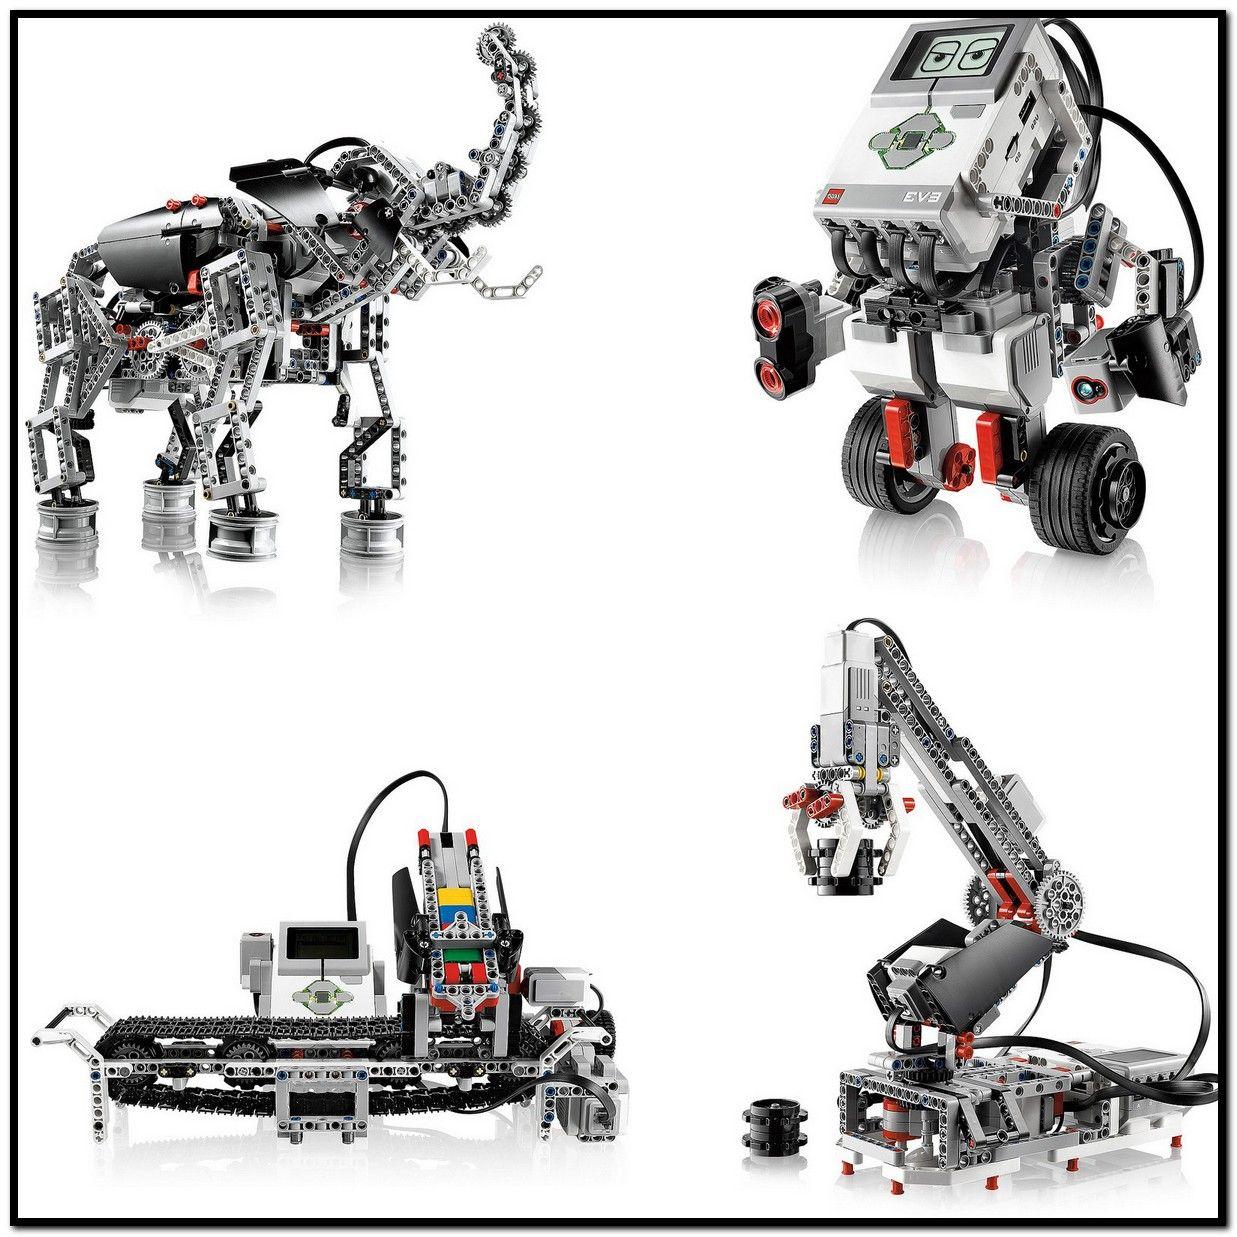 The New Lego Mindstorms EV3   i Brick City